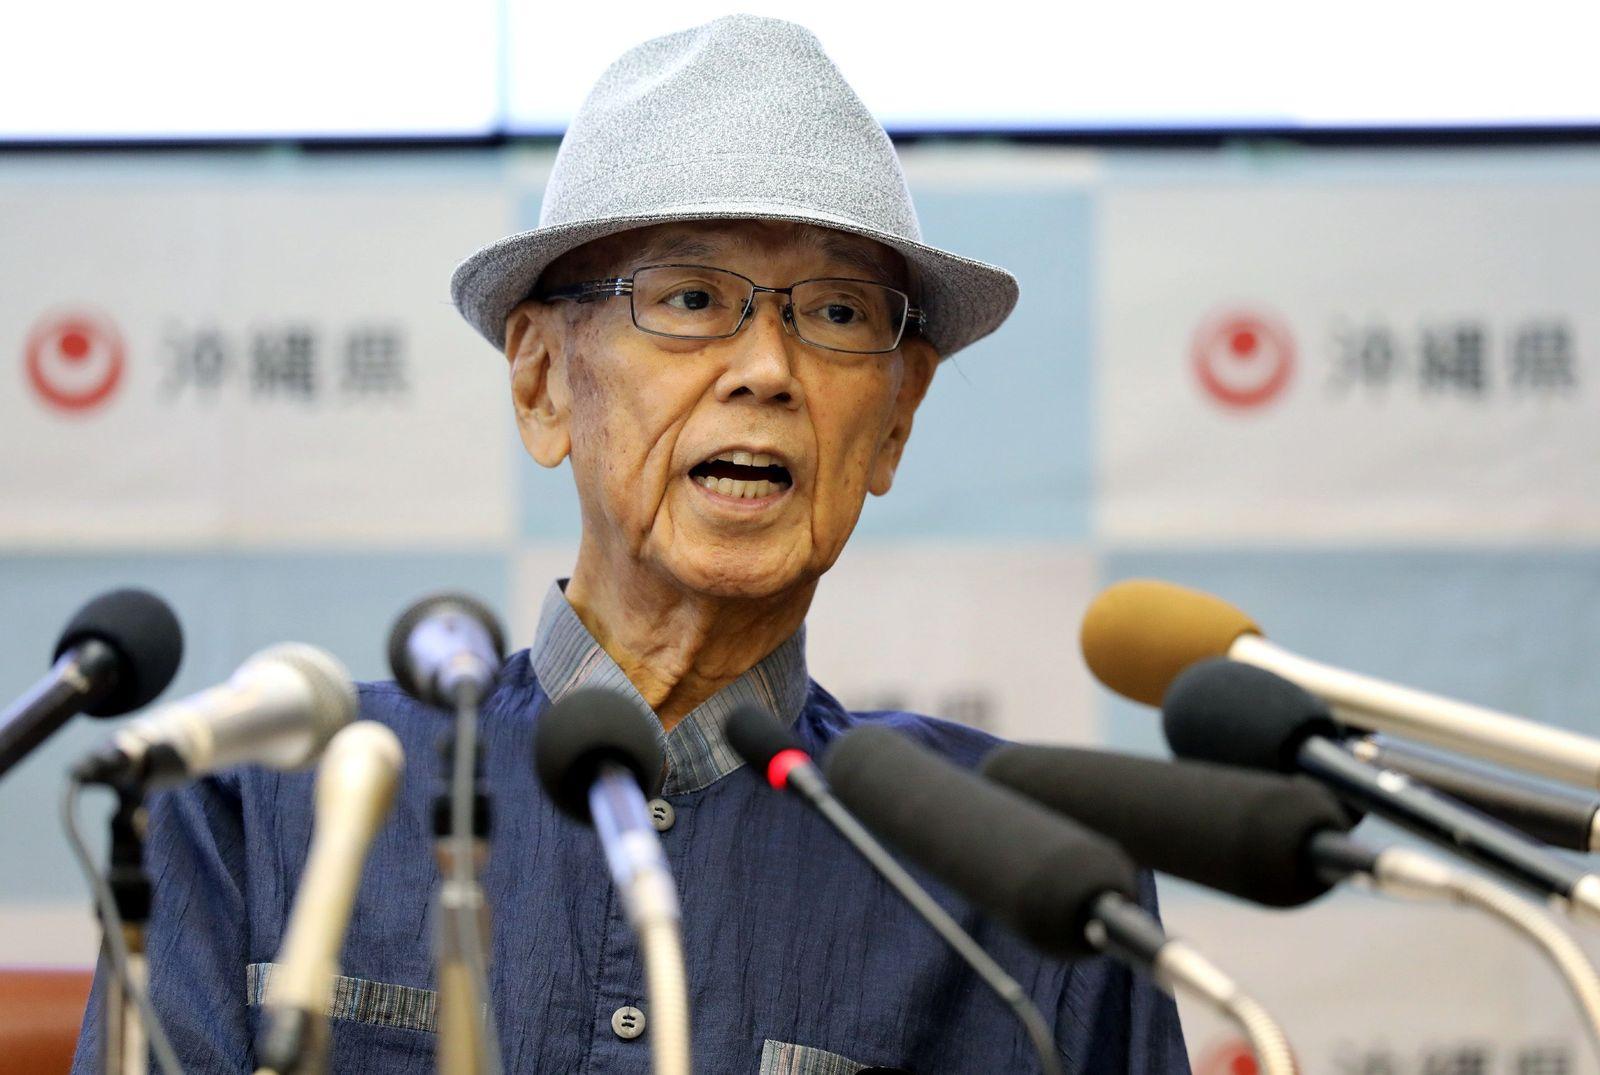 Japan/Okinawa/Takeshi Onaga